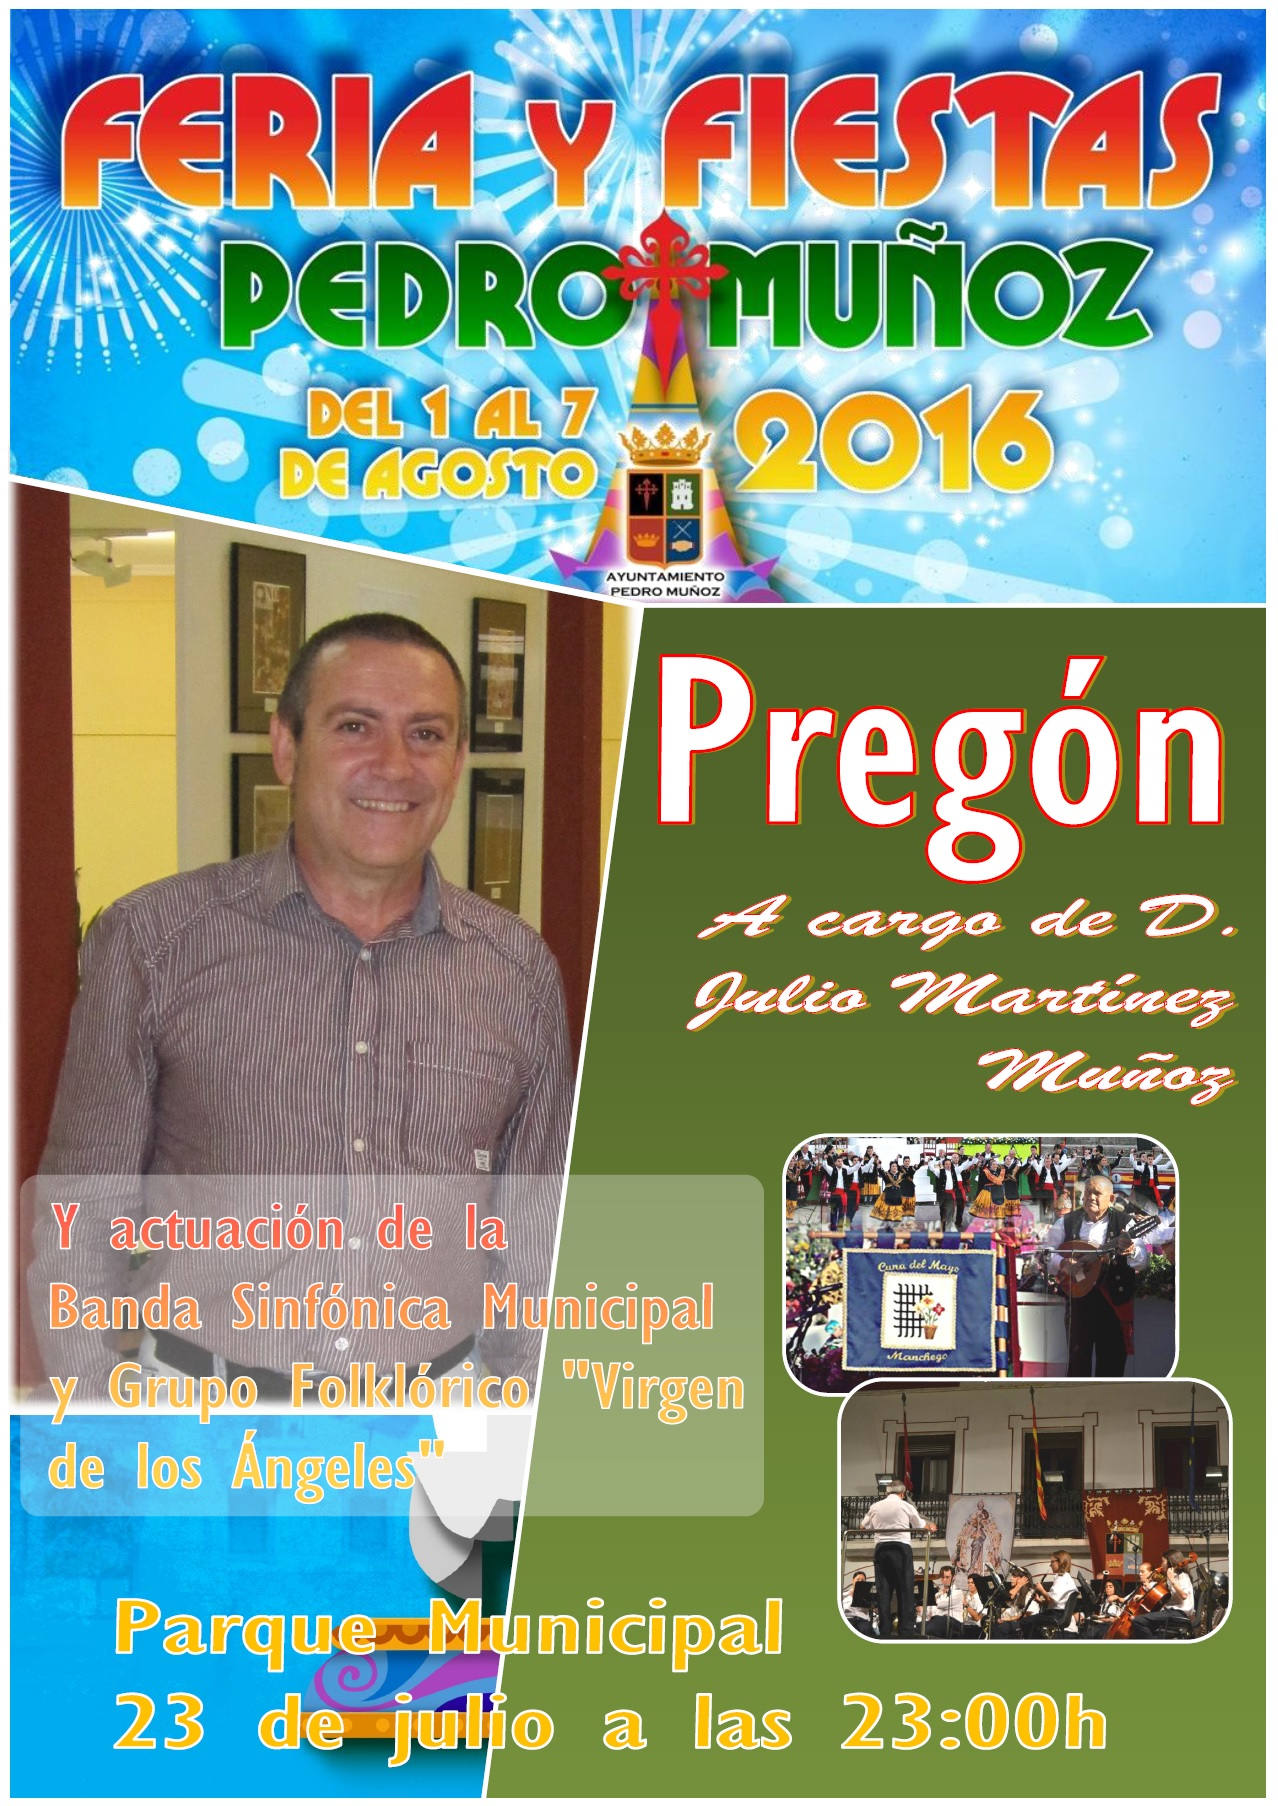 Julio Martínez Muñoz será pregonero de la feria y fiestas 2016 de Pedro Muñoz